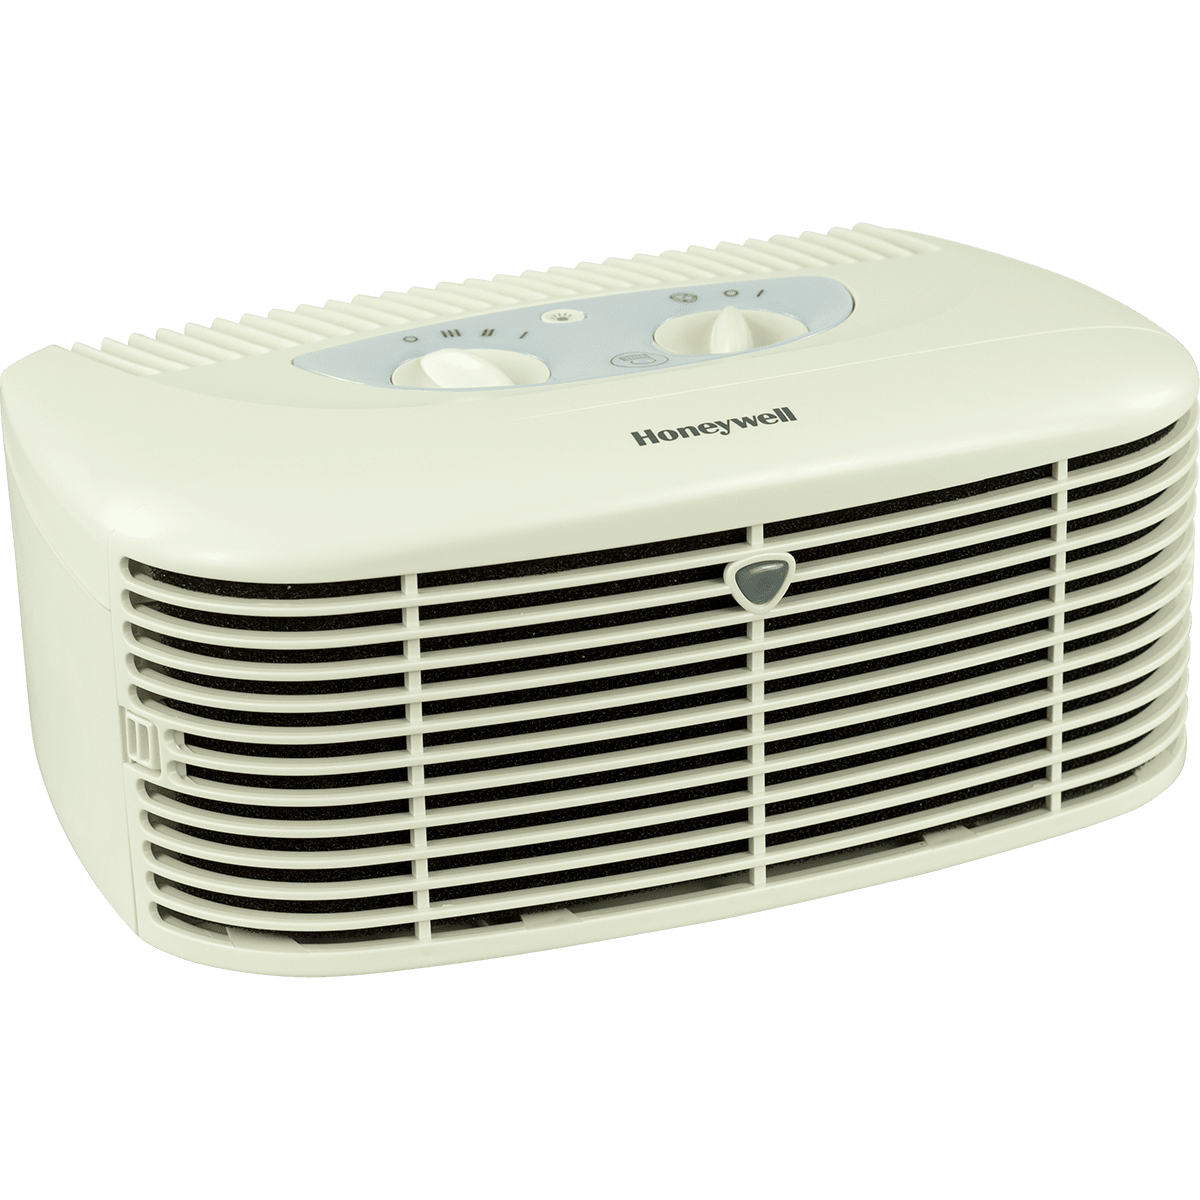 Honeywell Permanent HEPAClean Compact Air Purifier (HHT-011) ho1605